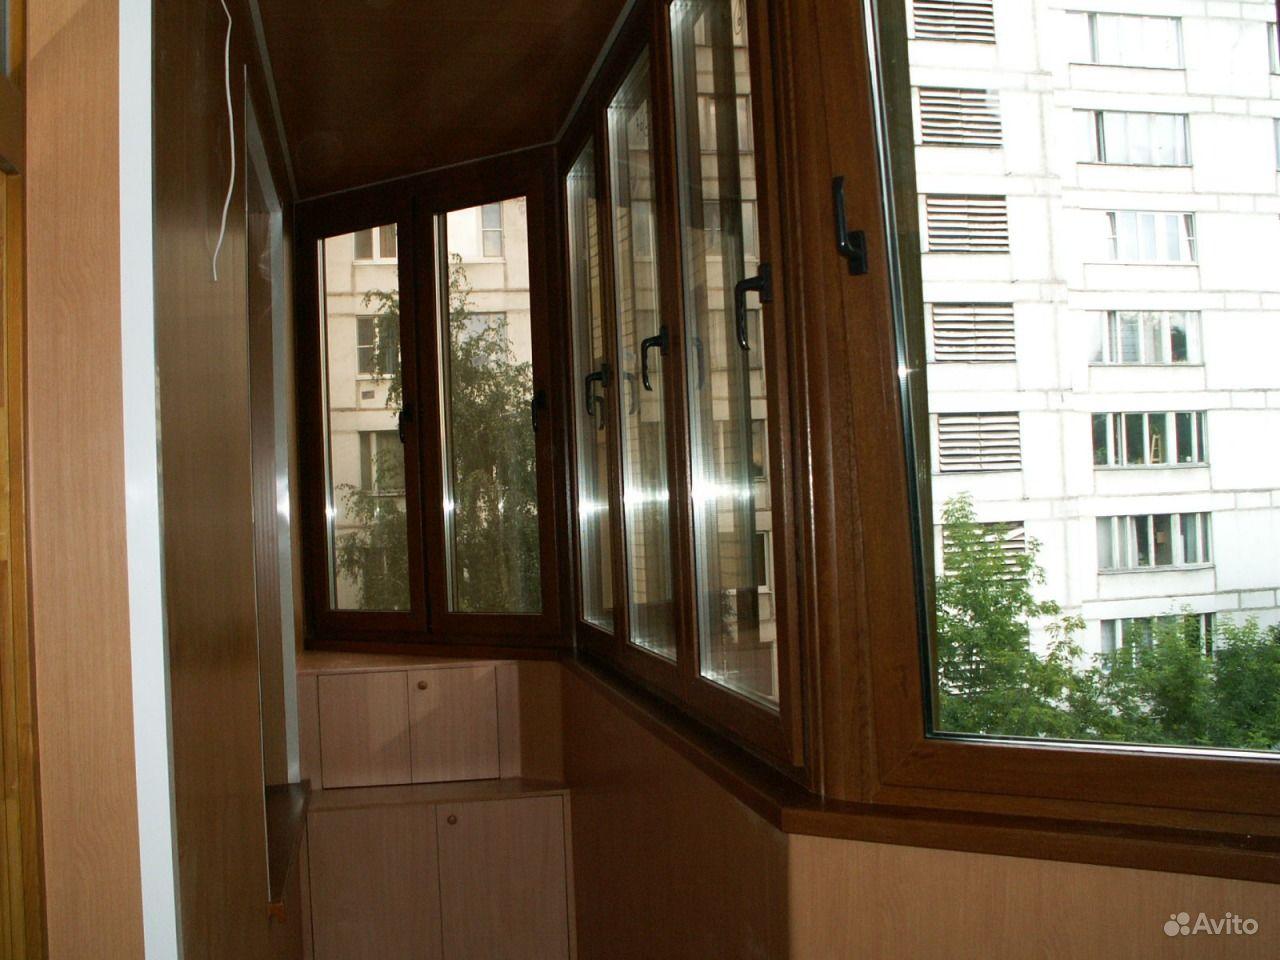 Балкон типа утюжок.